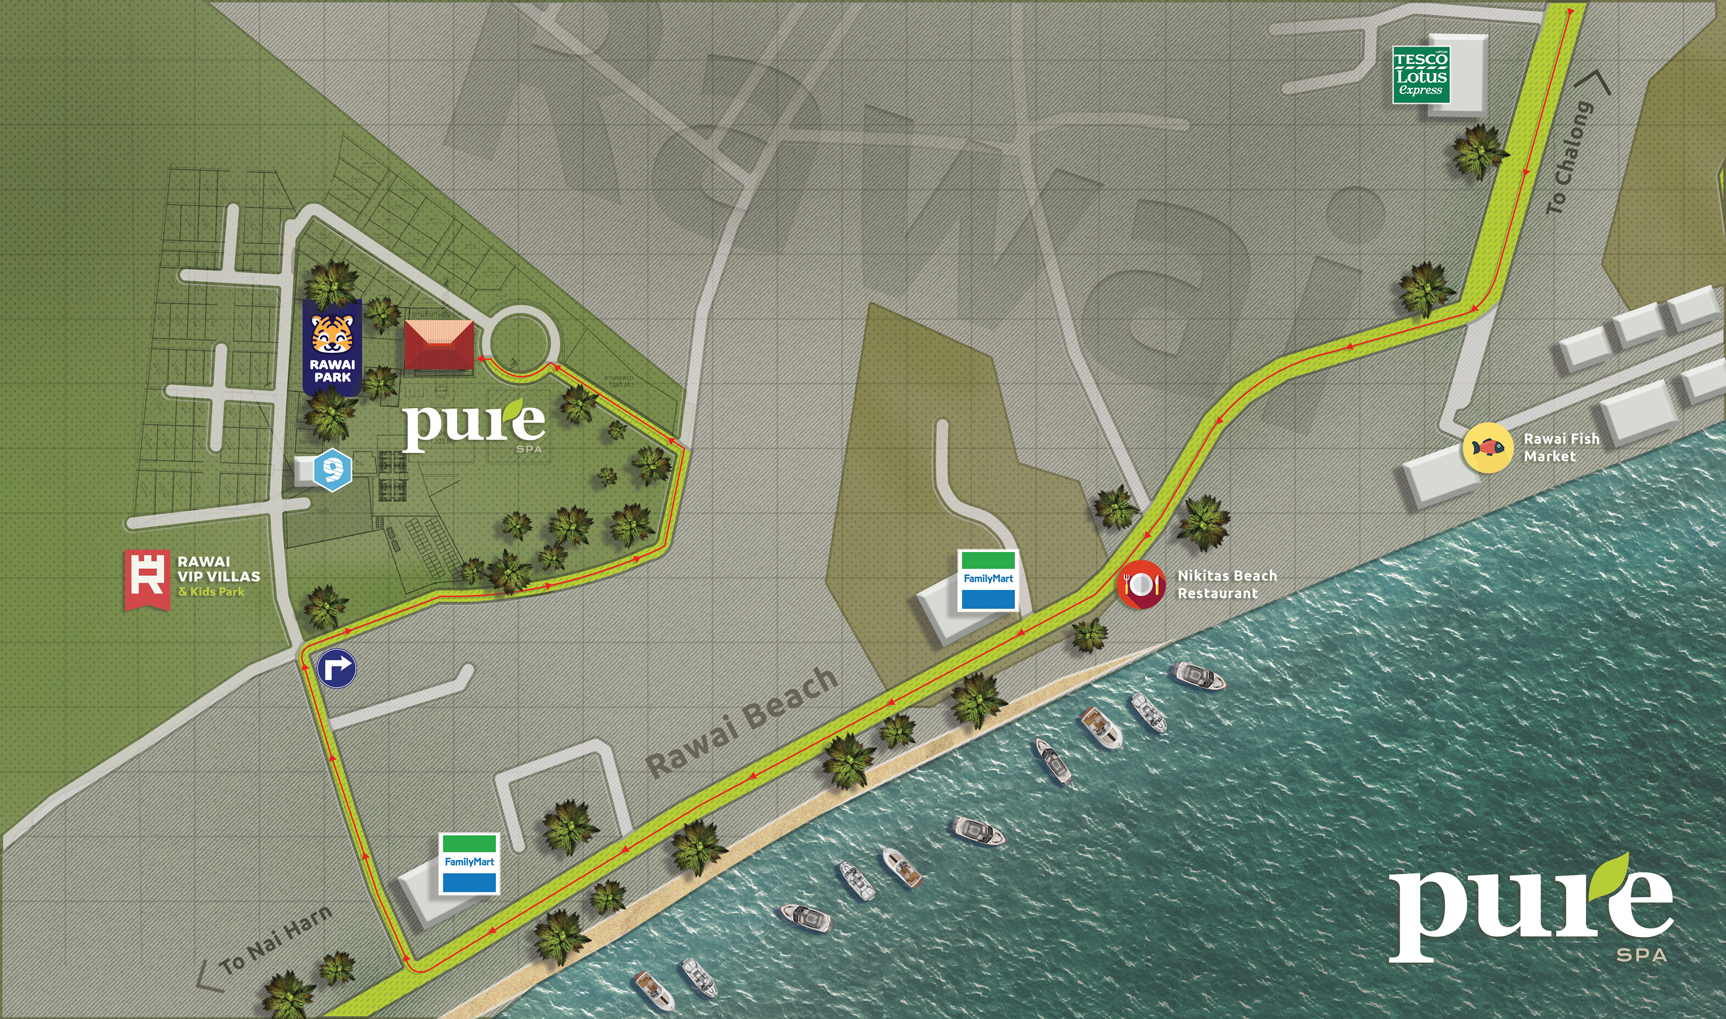 phuket spa address location rawai beach